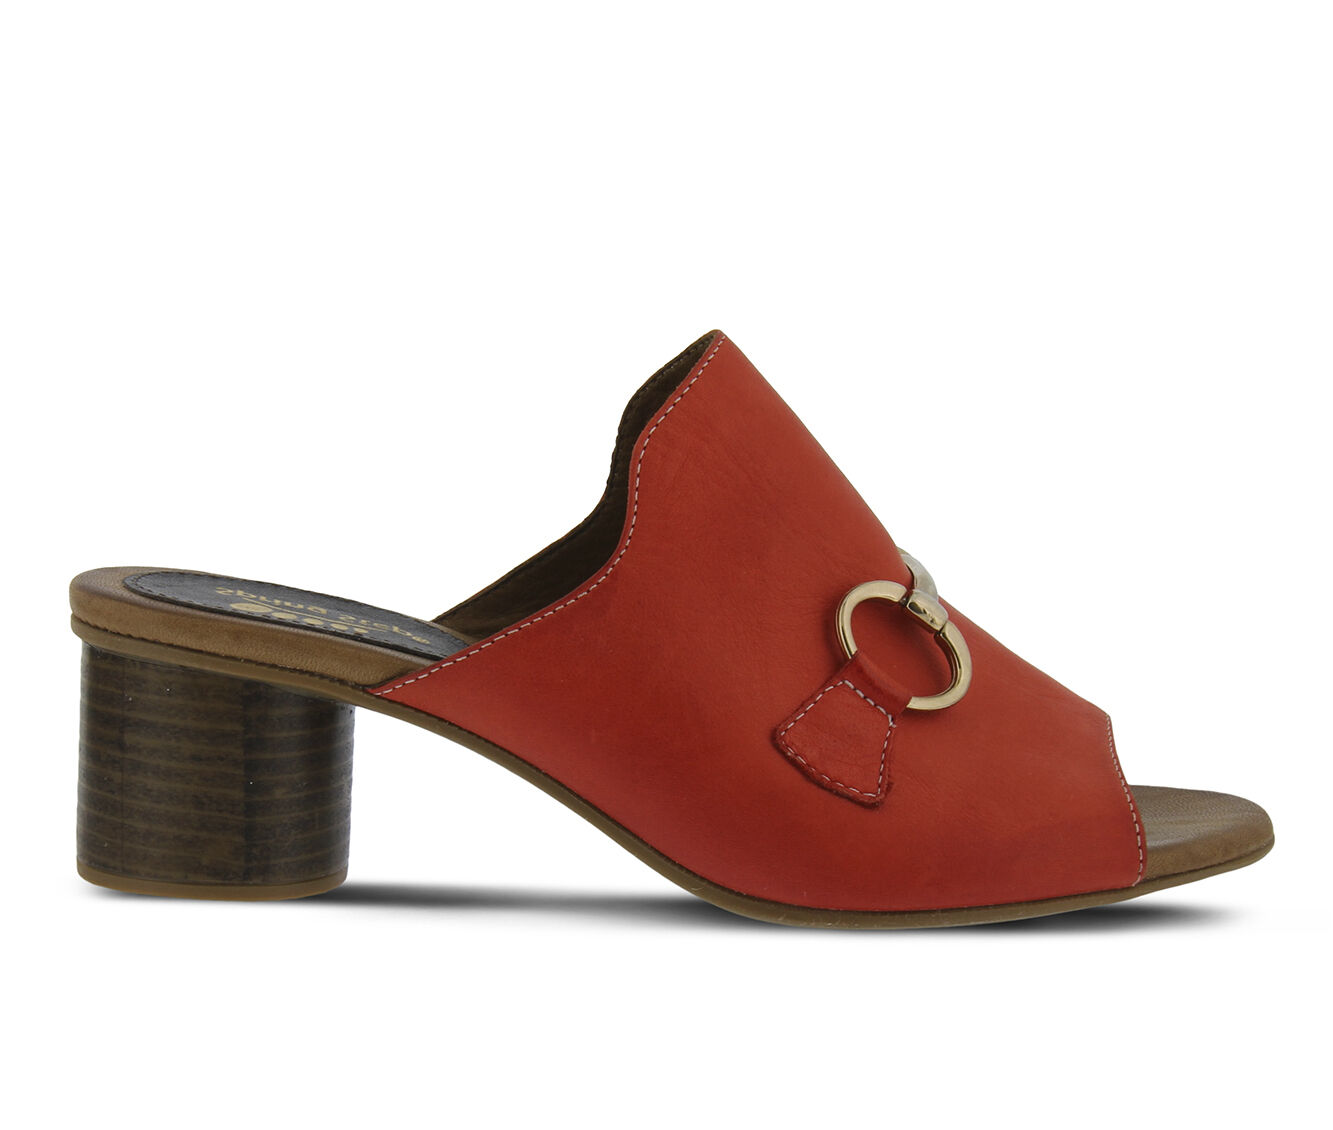 get cheap authentic Women's SPRING STEP Deisyluv Dress Sandals Red